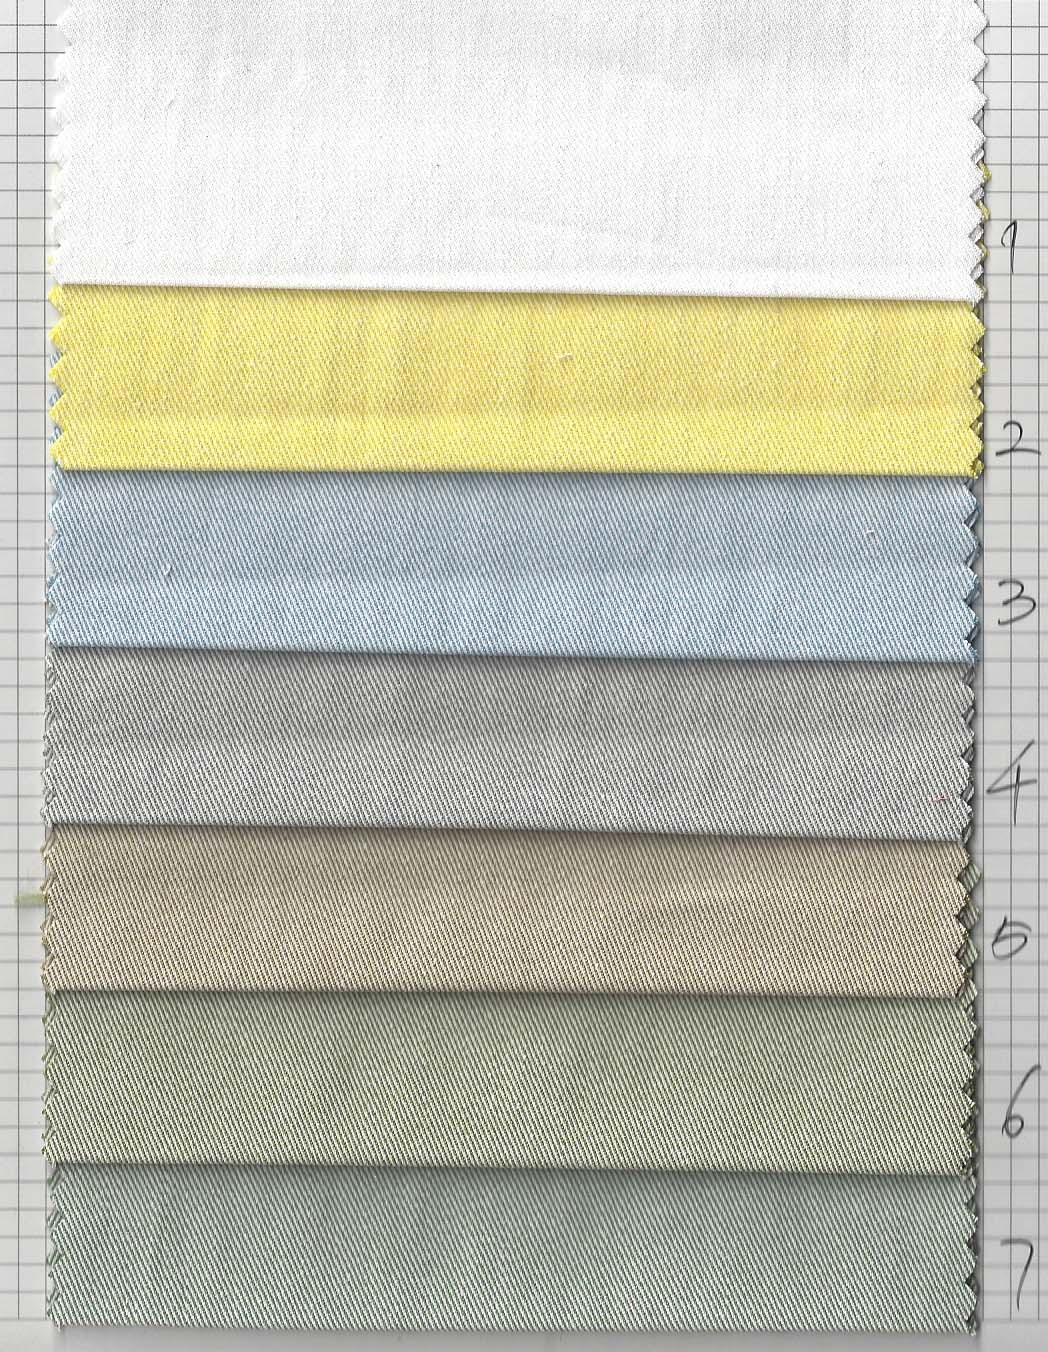 Tai Sheng Textile TS528.jpg